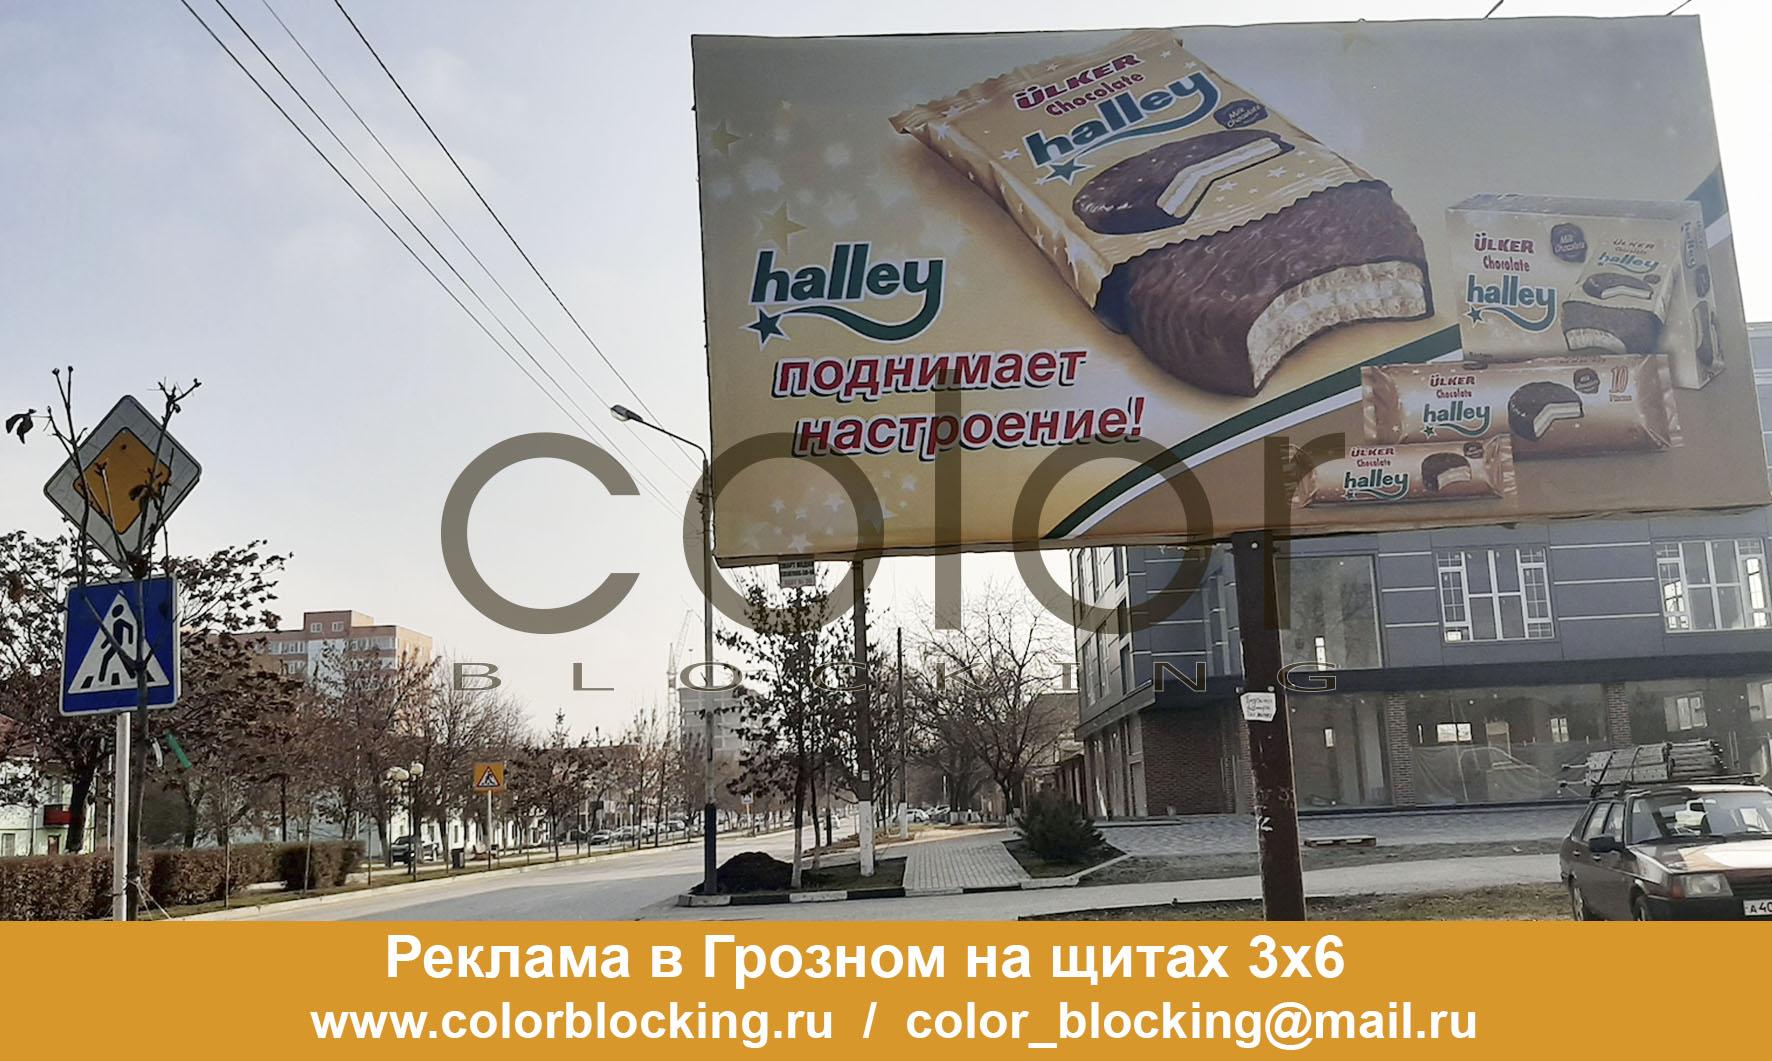 Реклама в Грозном на щитах 3х6 Кадырова